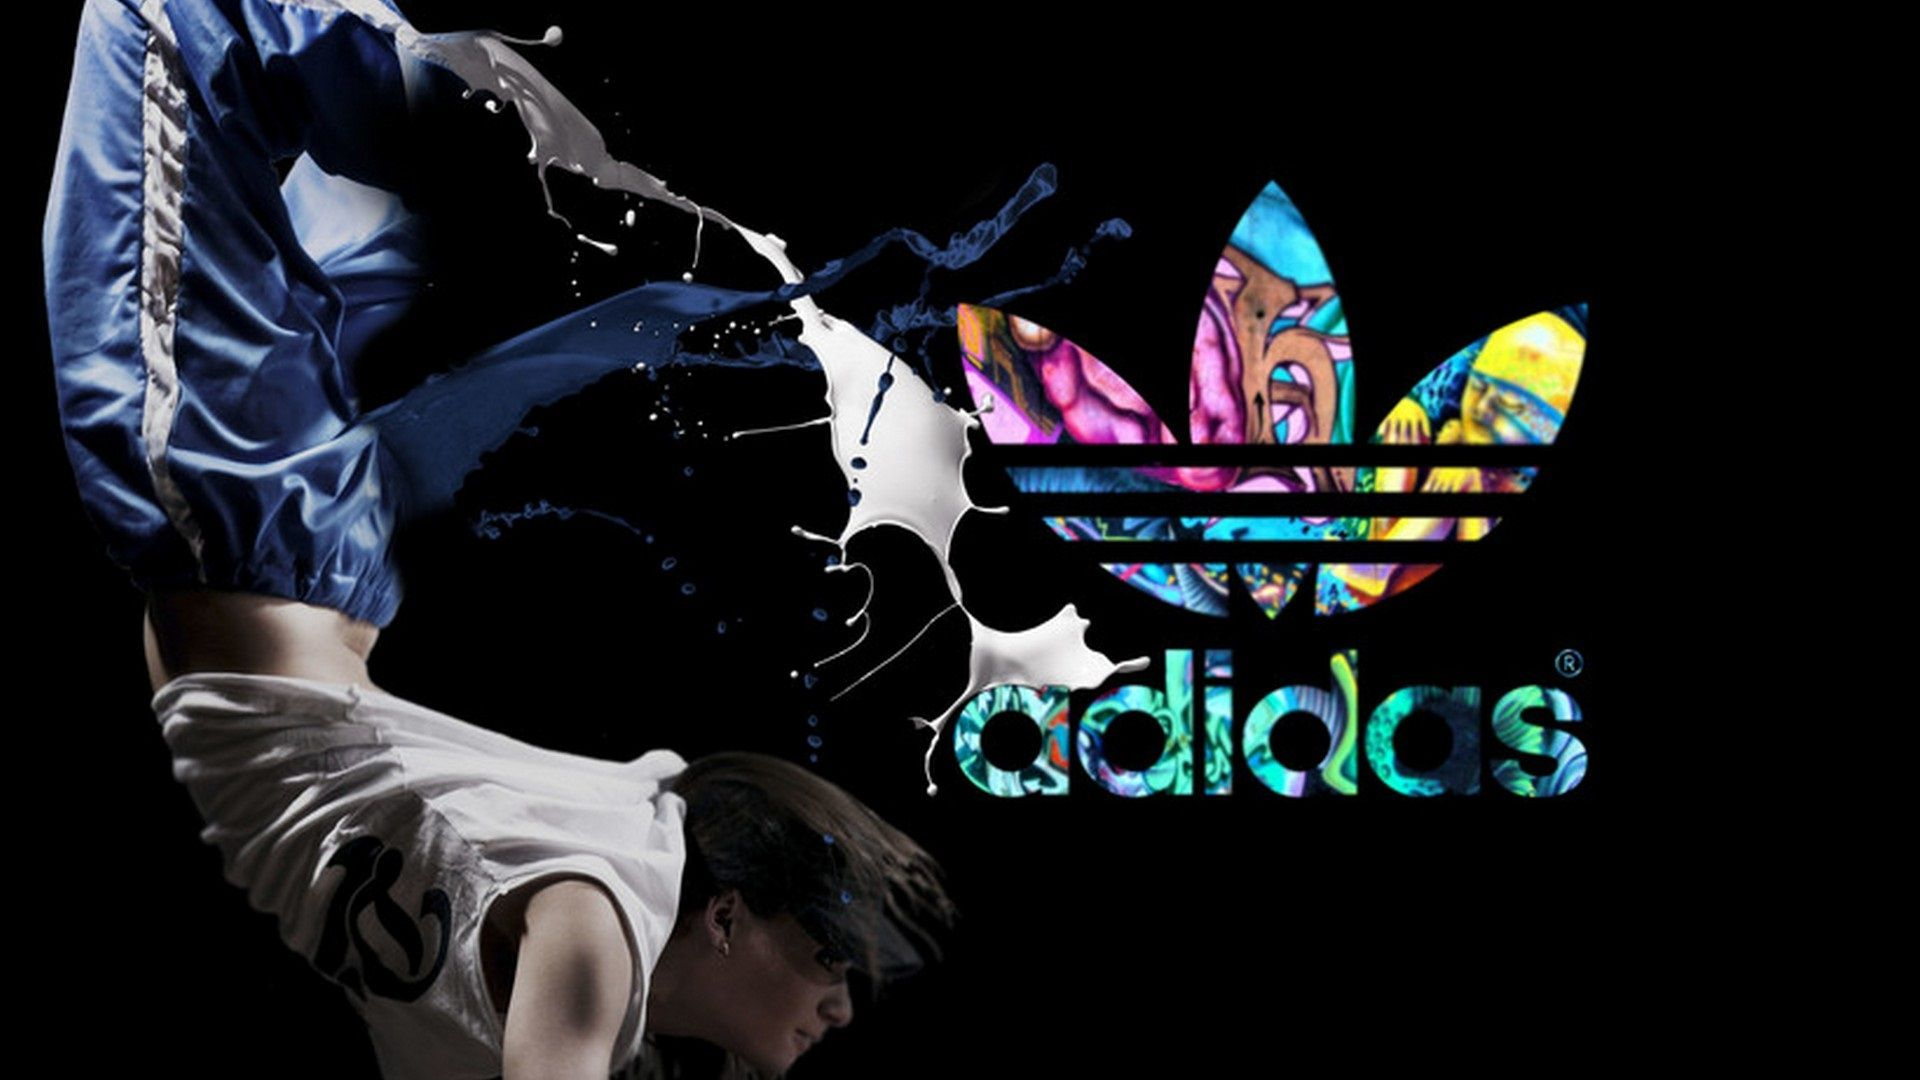 Best Adidas Wallpaper | Adidas wallpapers, Cute wallpapers ...